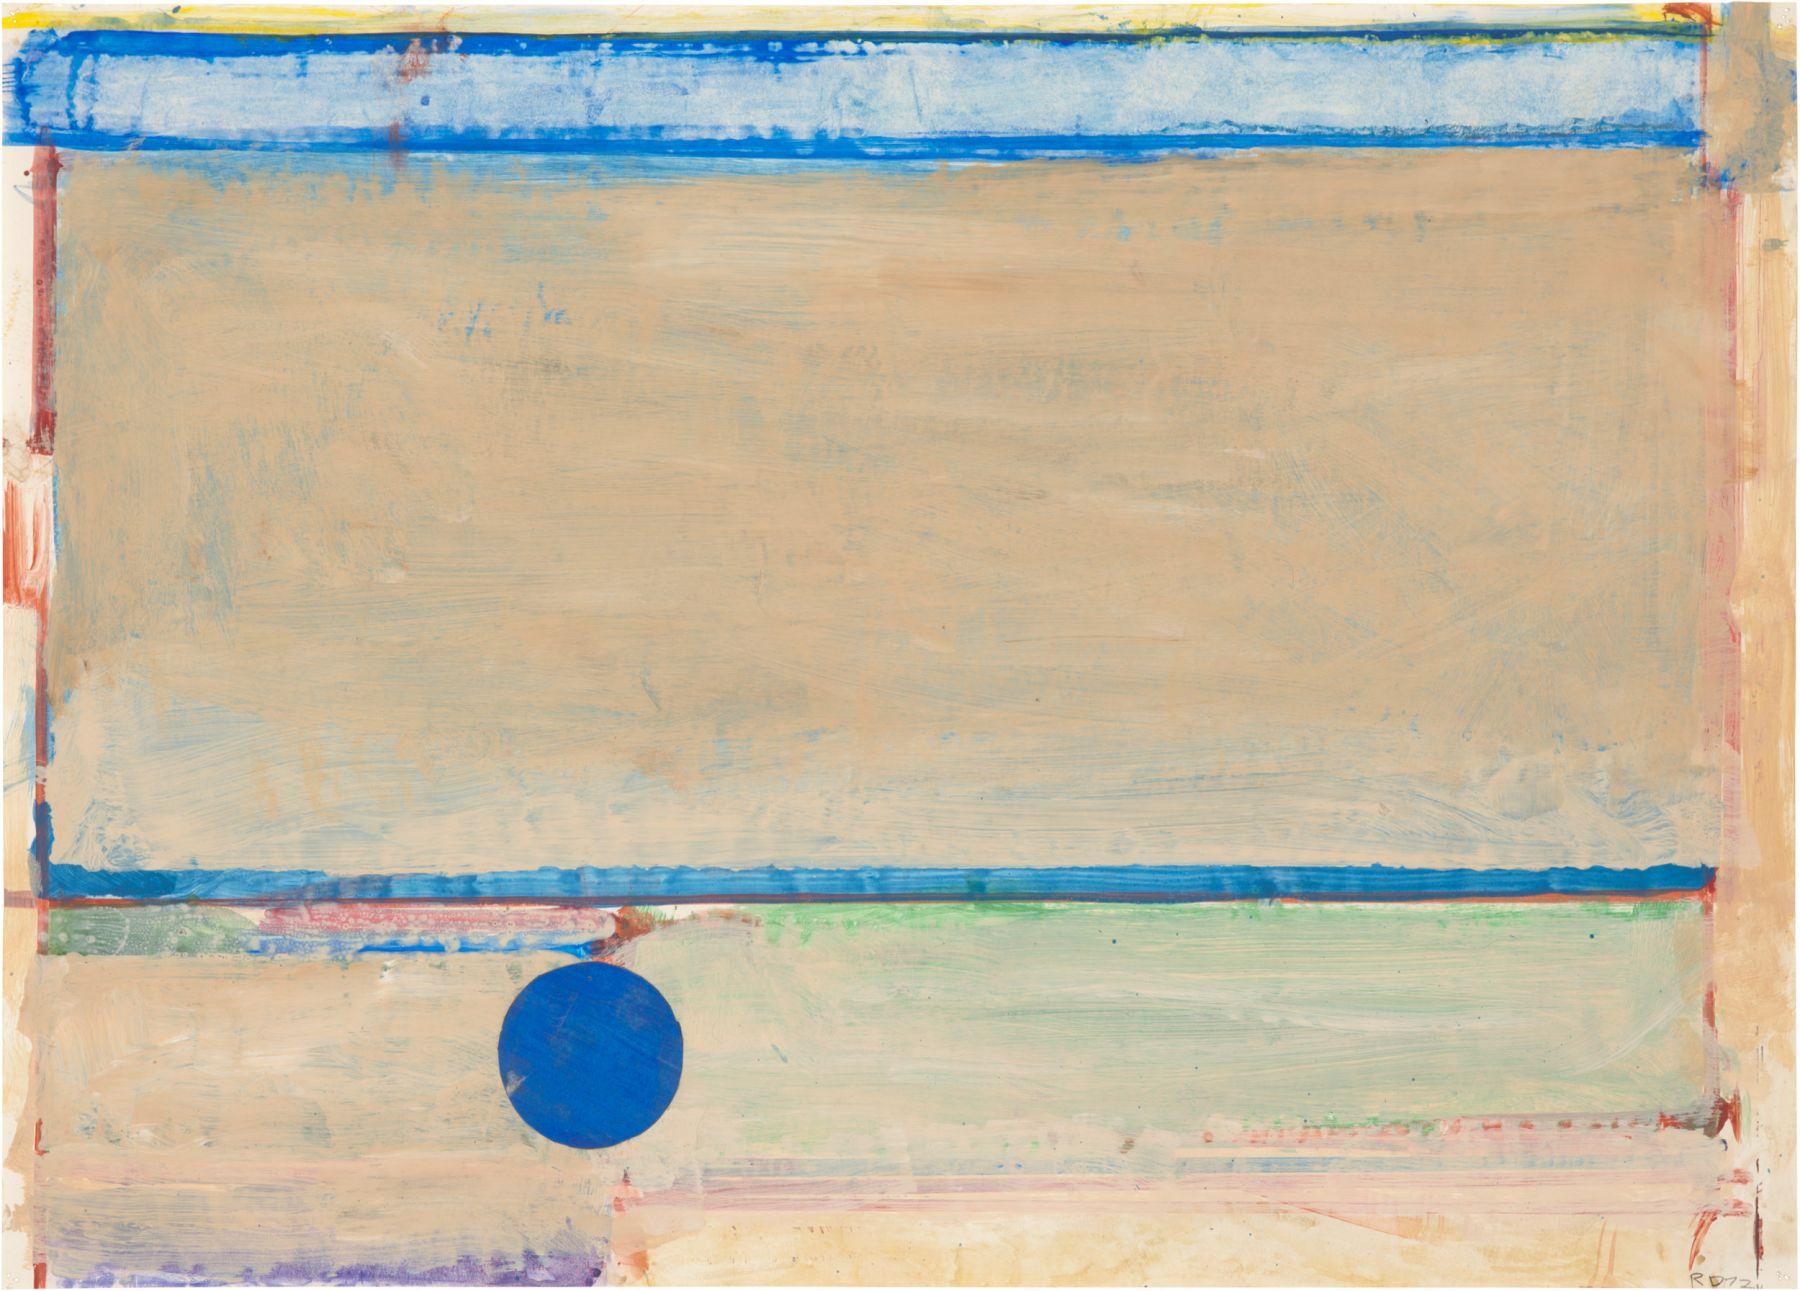 Untitled (CR no. 4101), 1972